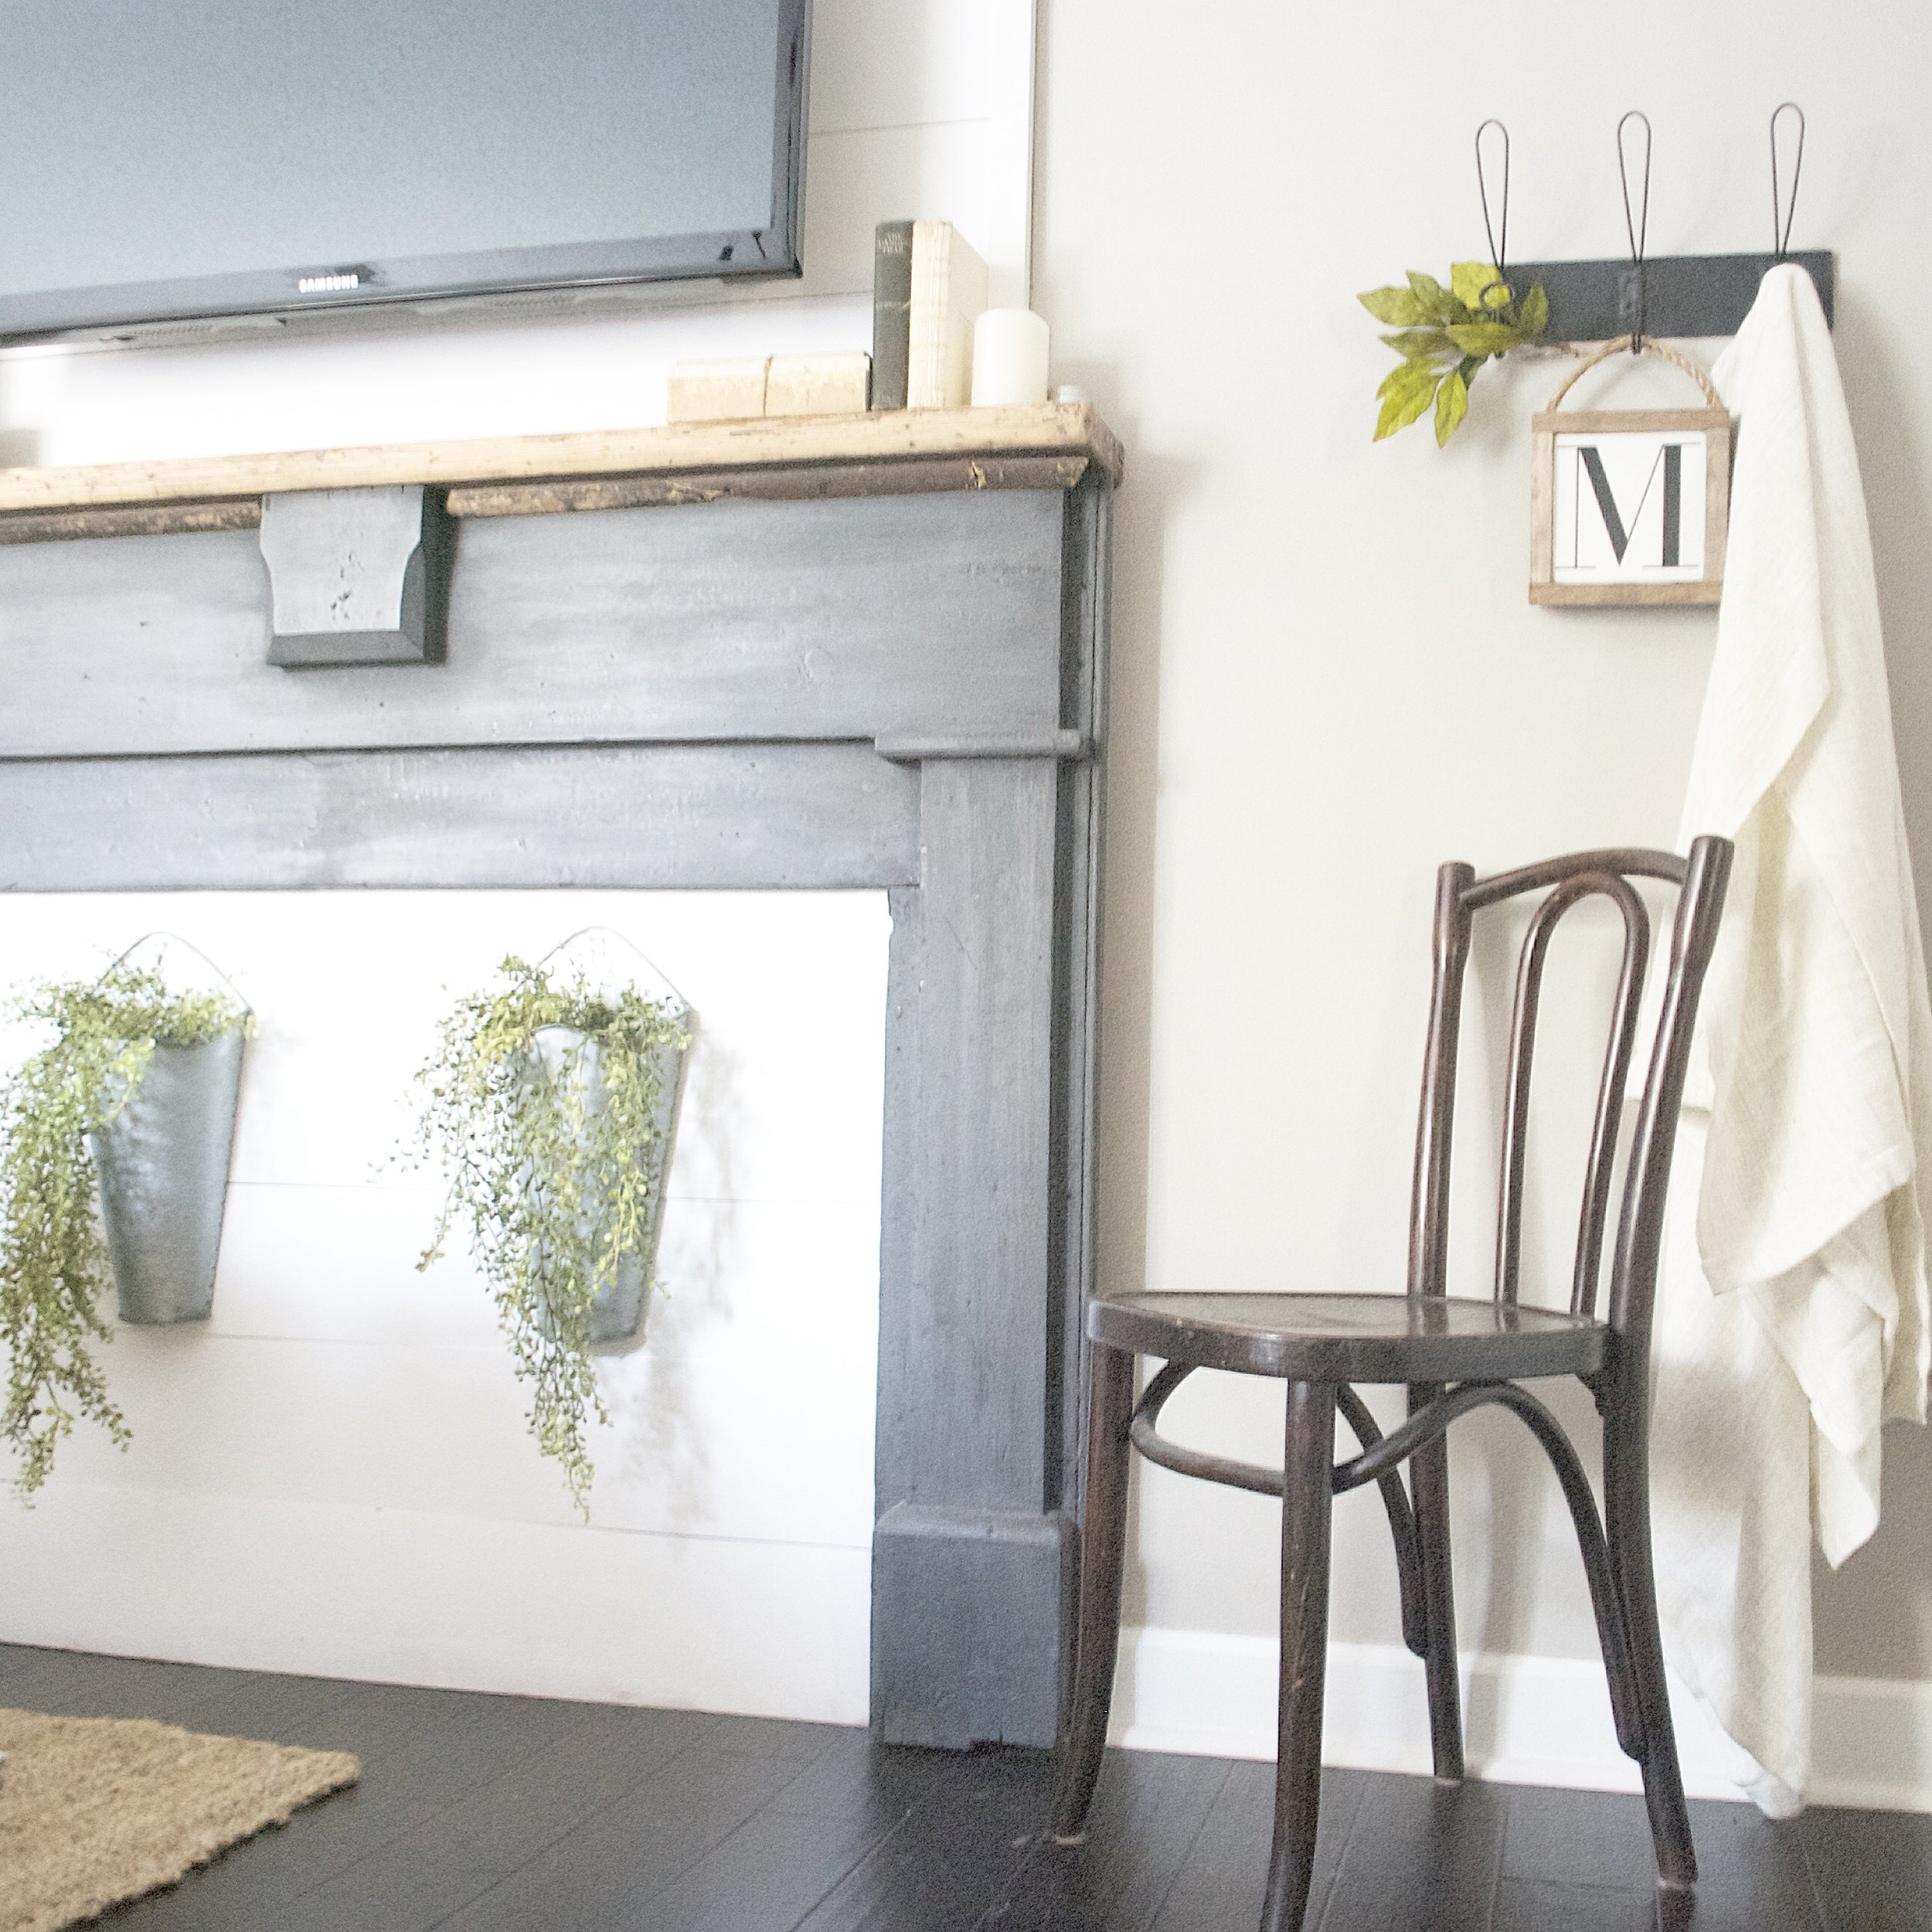 Plum Pretty Decor and Design Farmhouse Master Bedroom Tour- Entry